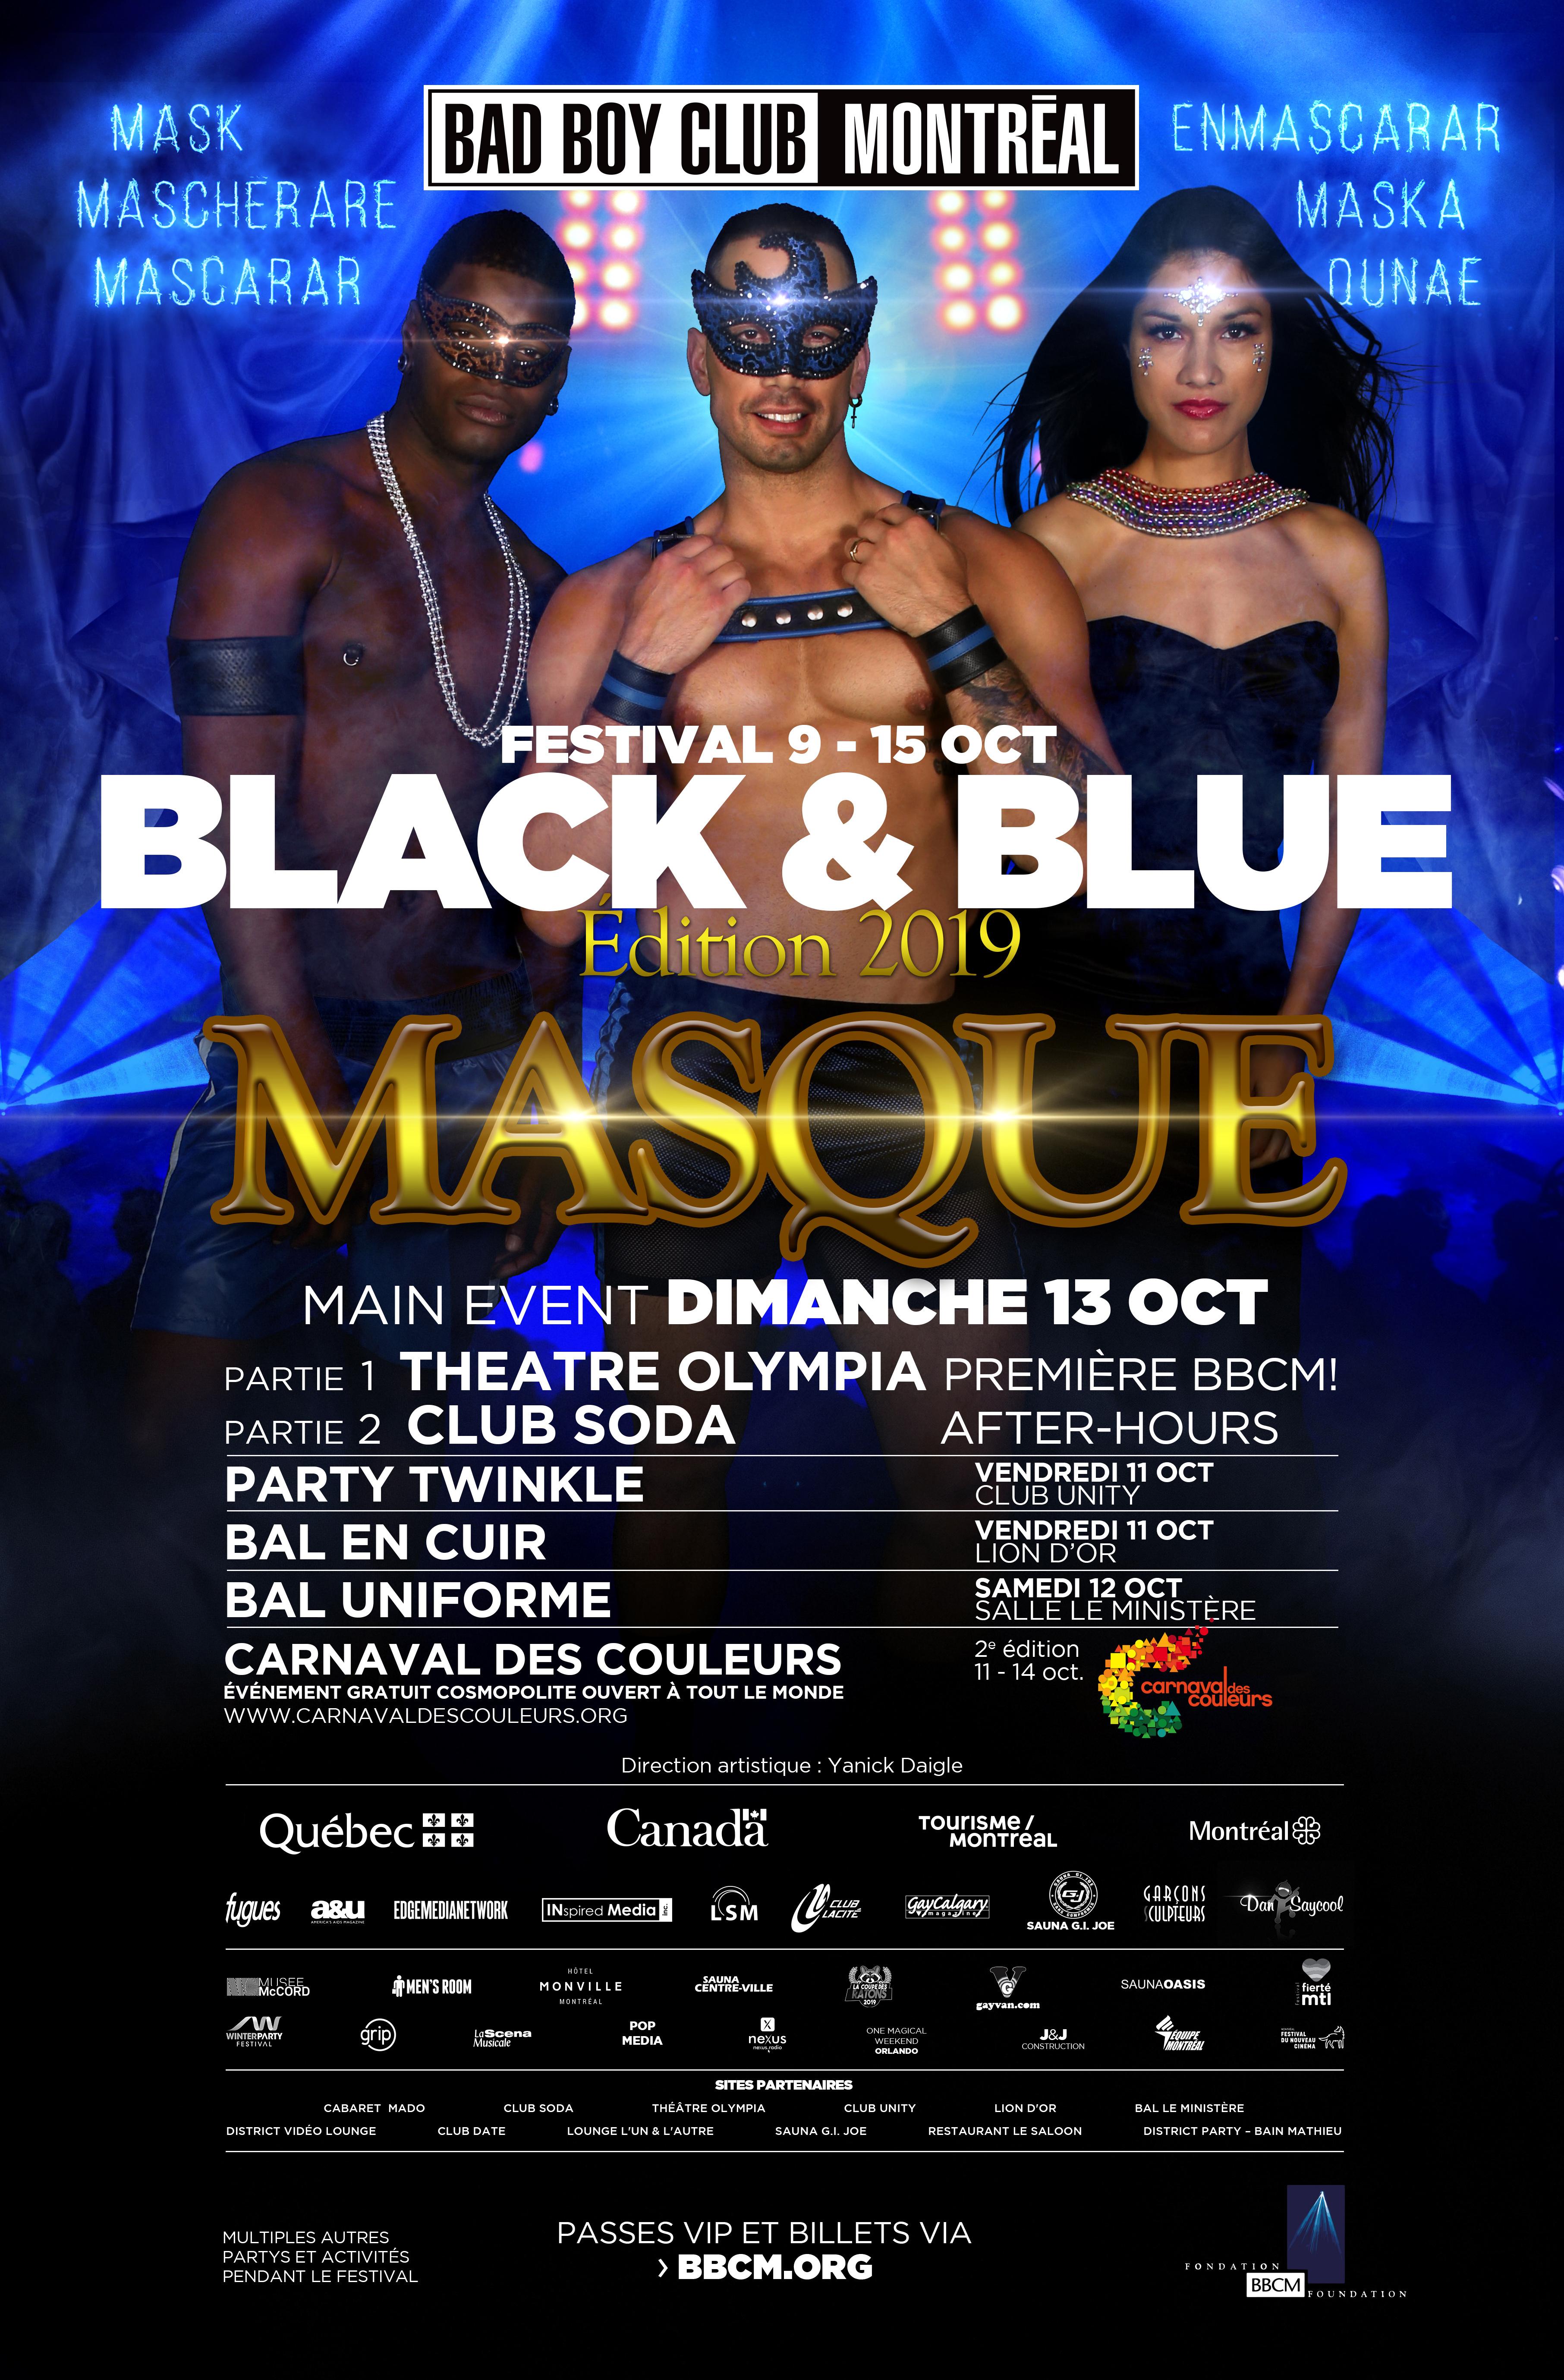 Black & Blue 2019